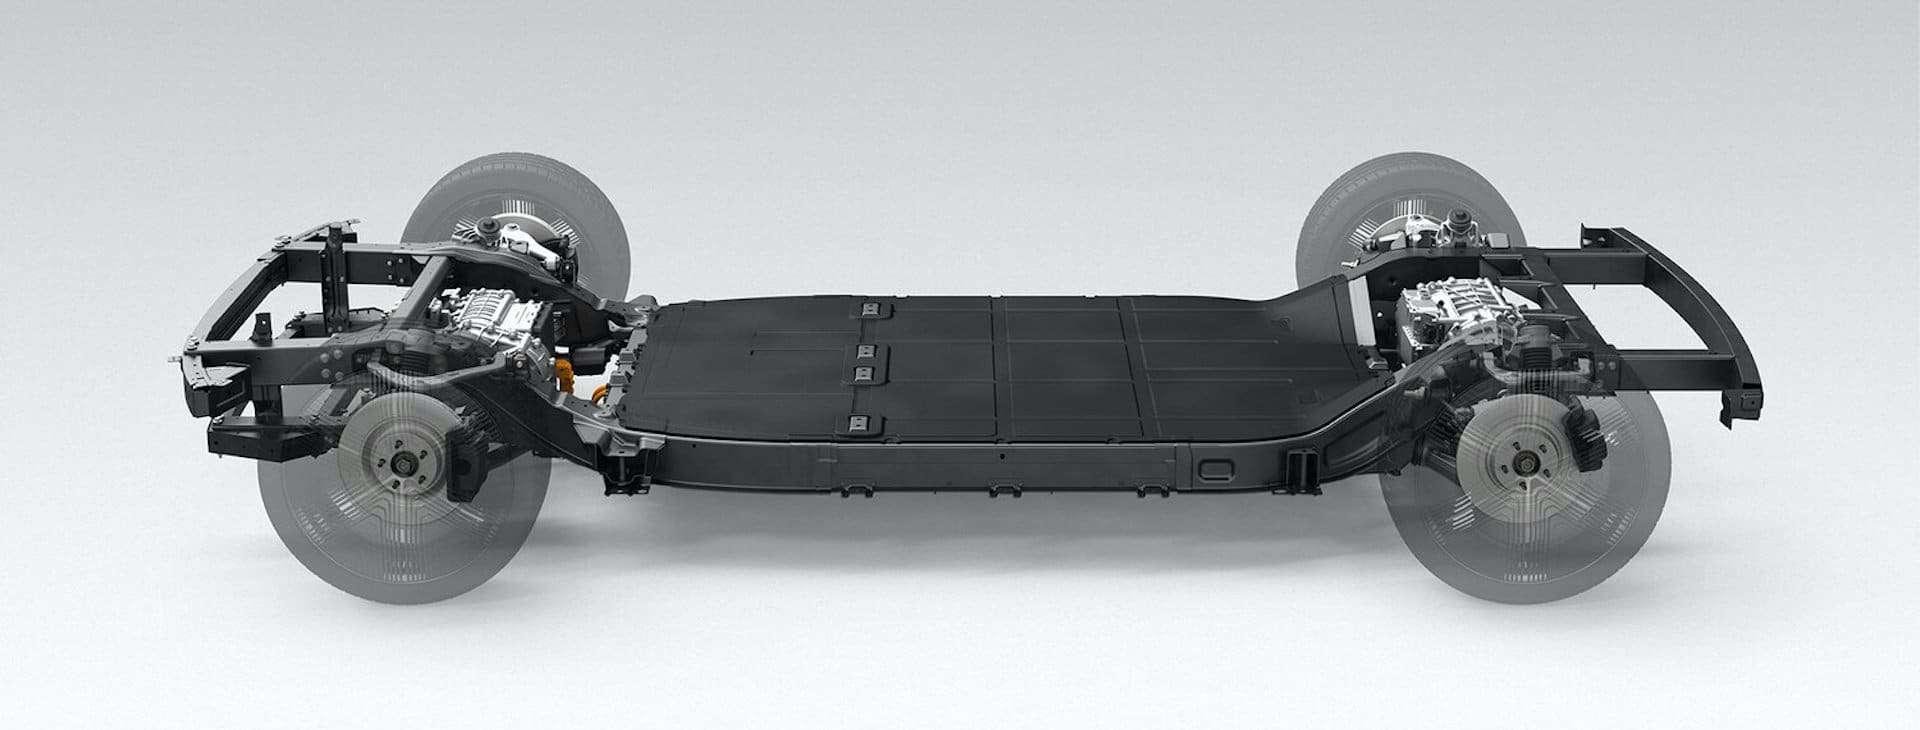 Canoo Elektroauto Skateboard Plattform